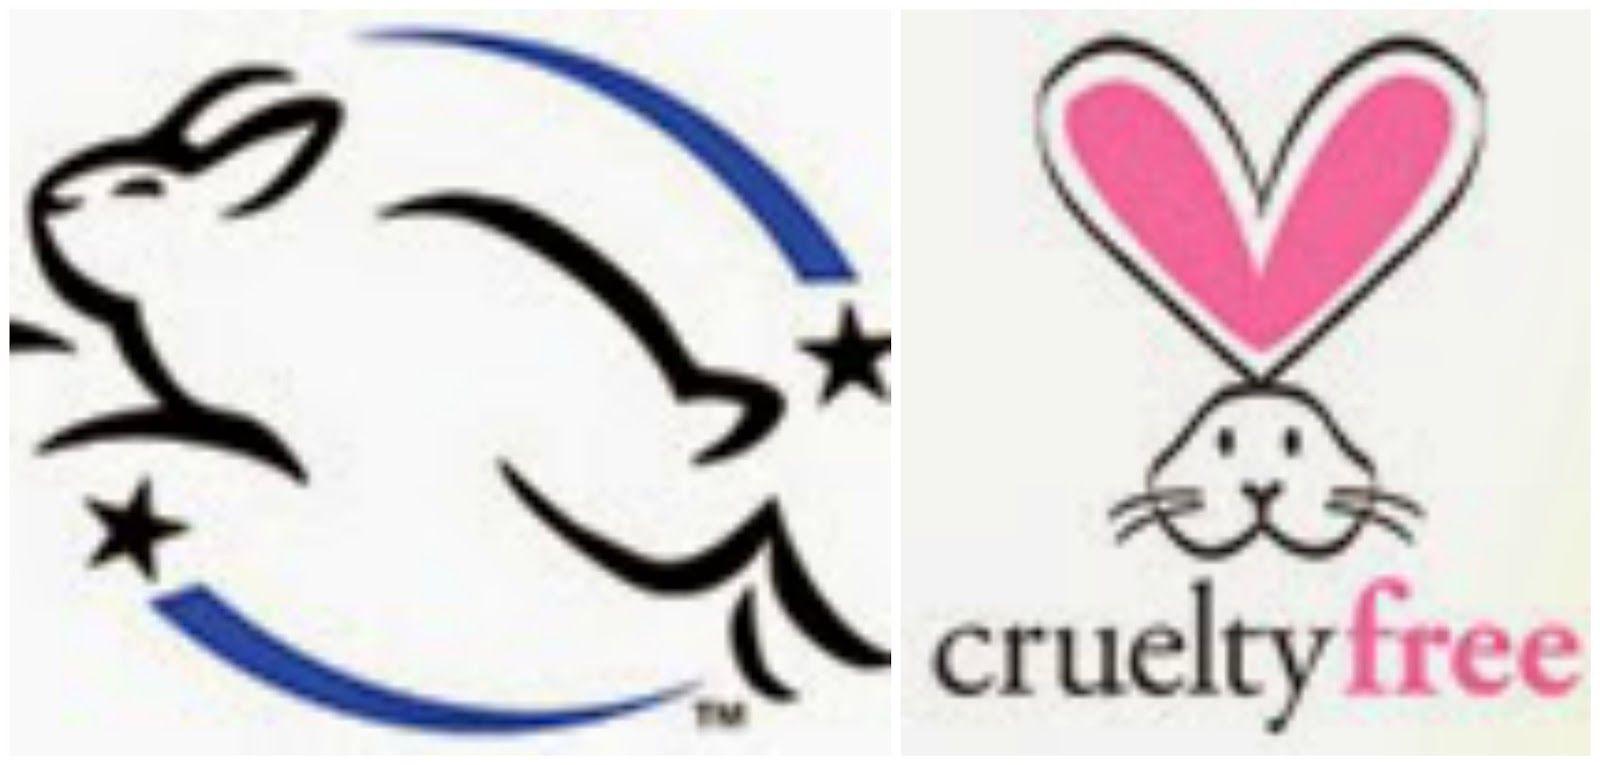 List of CrueltyFree Brands (UPDATED 2020) Cruelty free